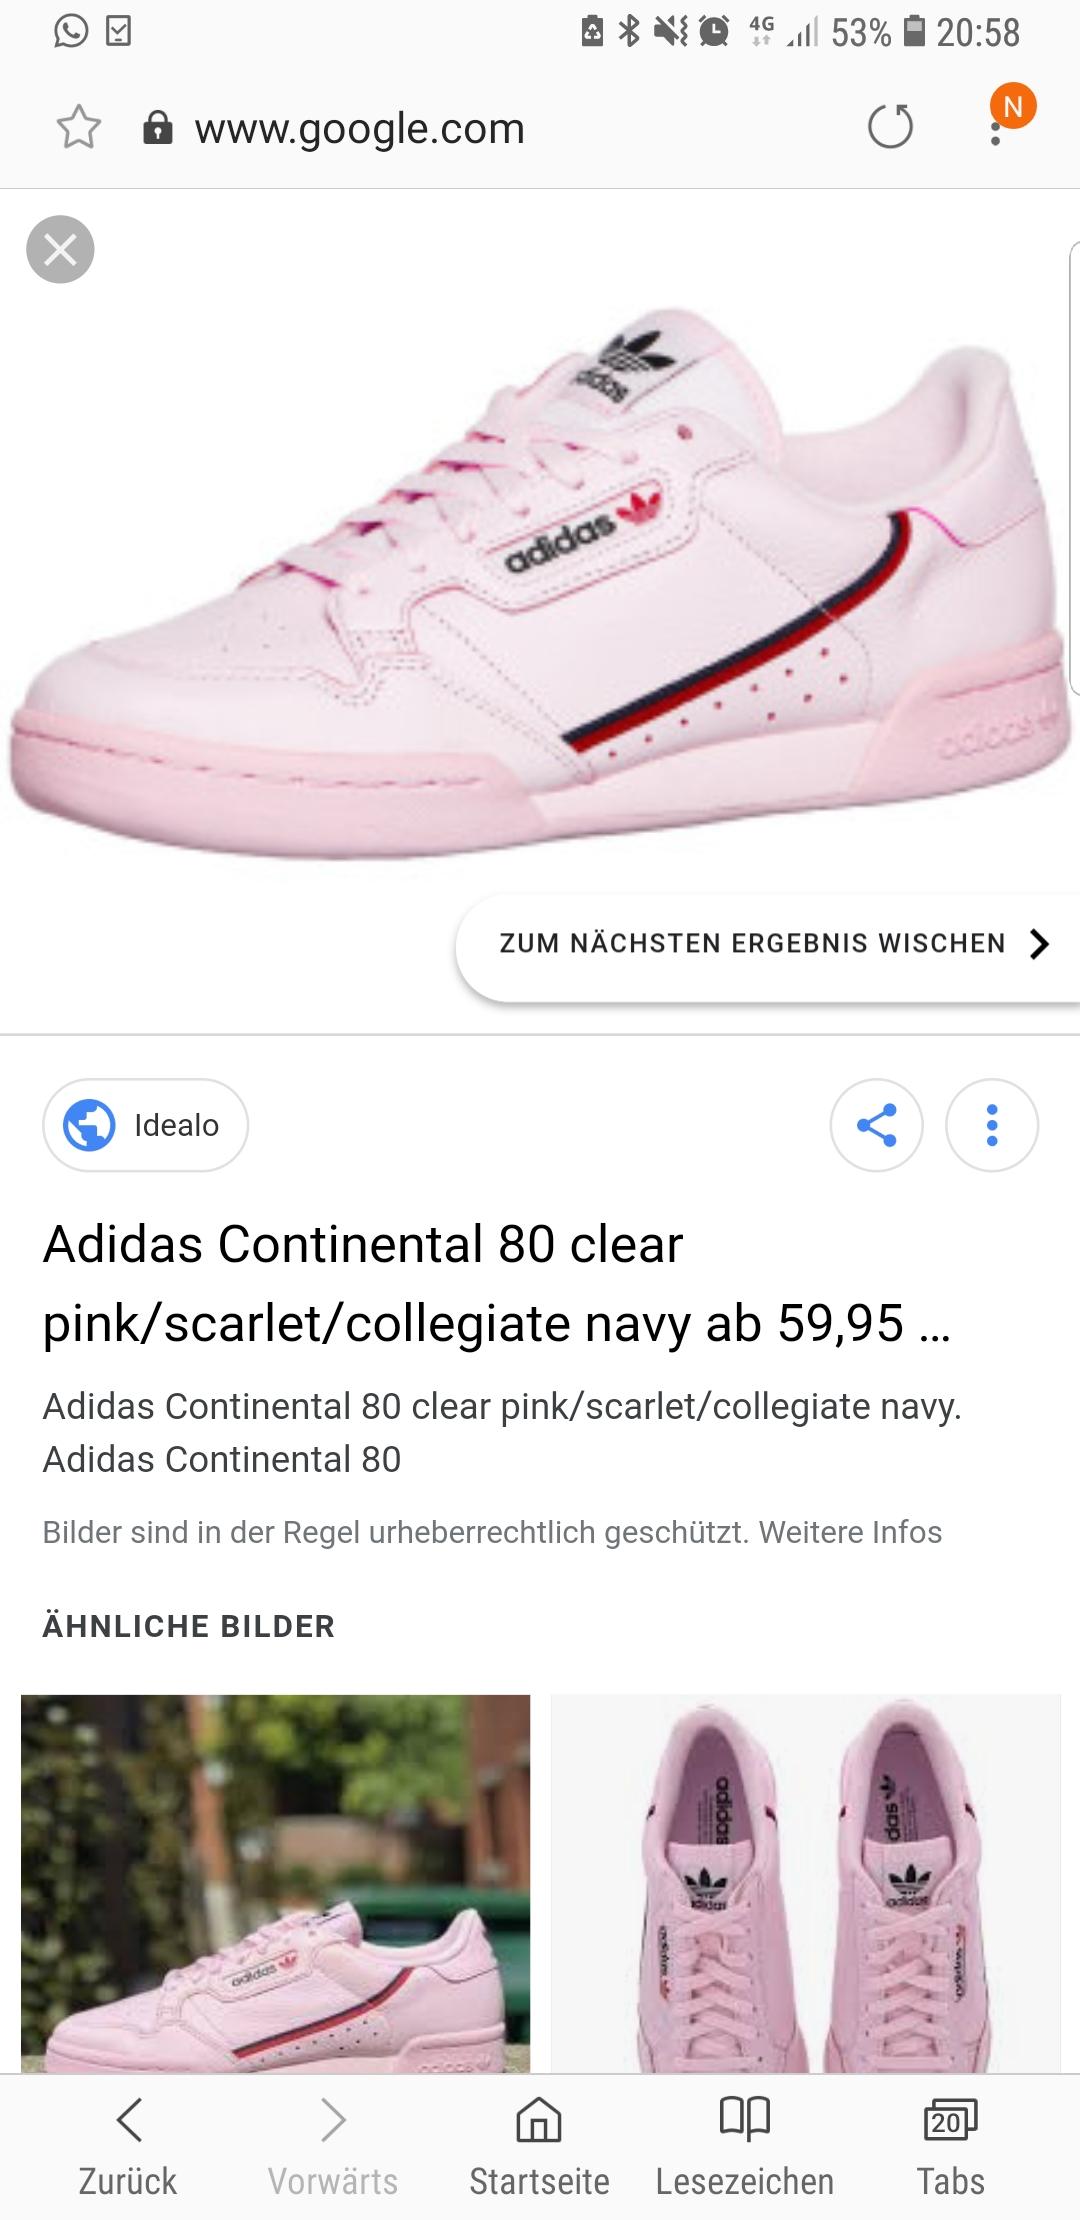 Mit was kann man pinke Adidas Schuhe kombinieren? (Mode